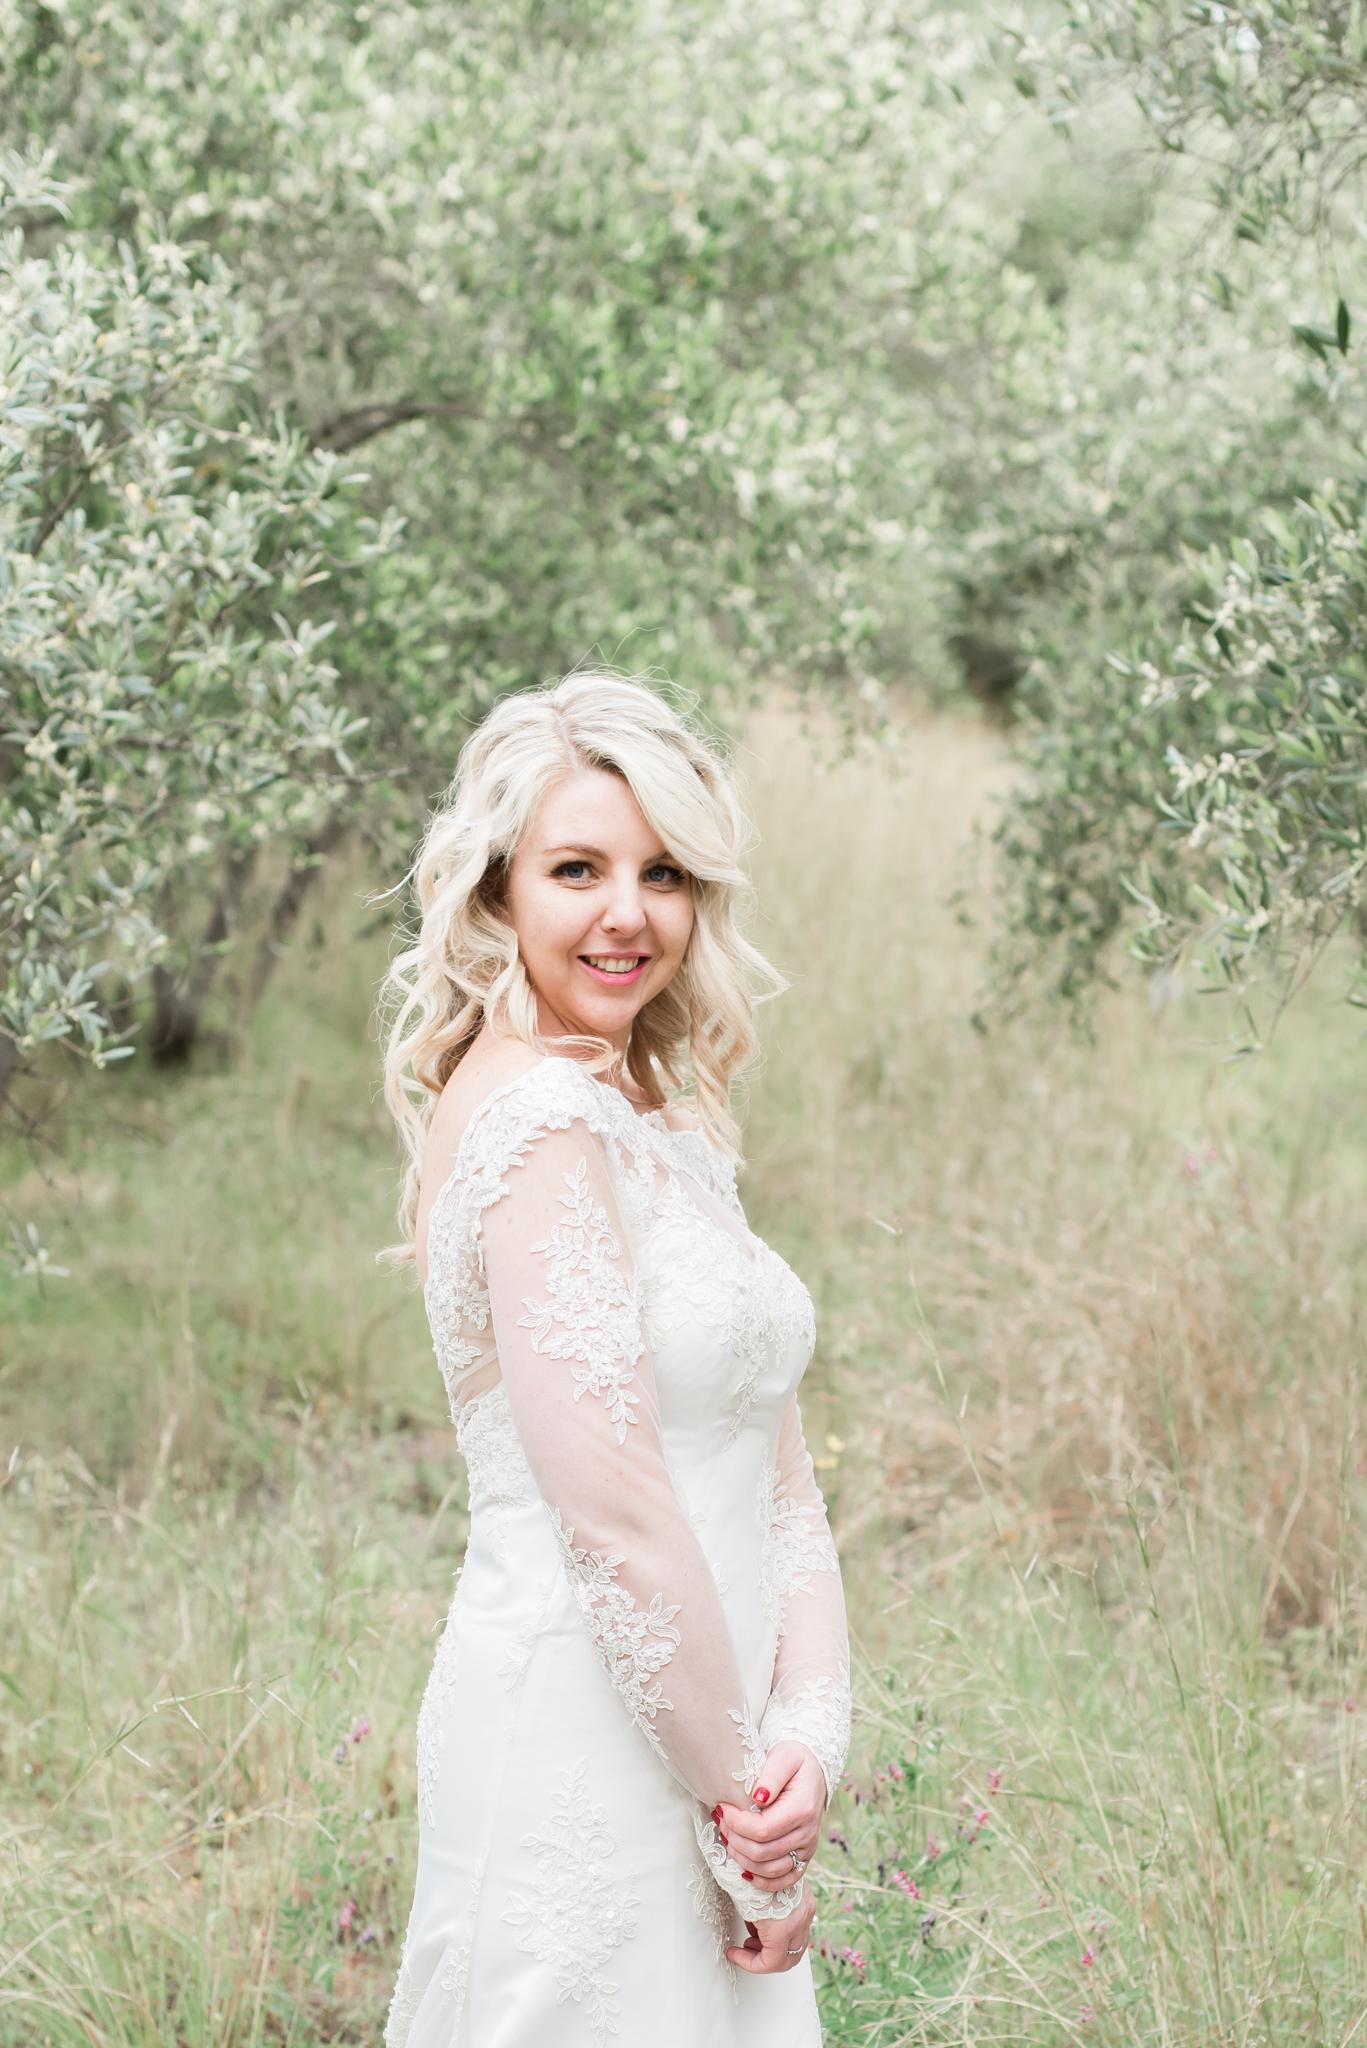 Angelique_Smith_Photography_Pieter&Yvonne_Wedding-396.jpg